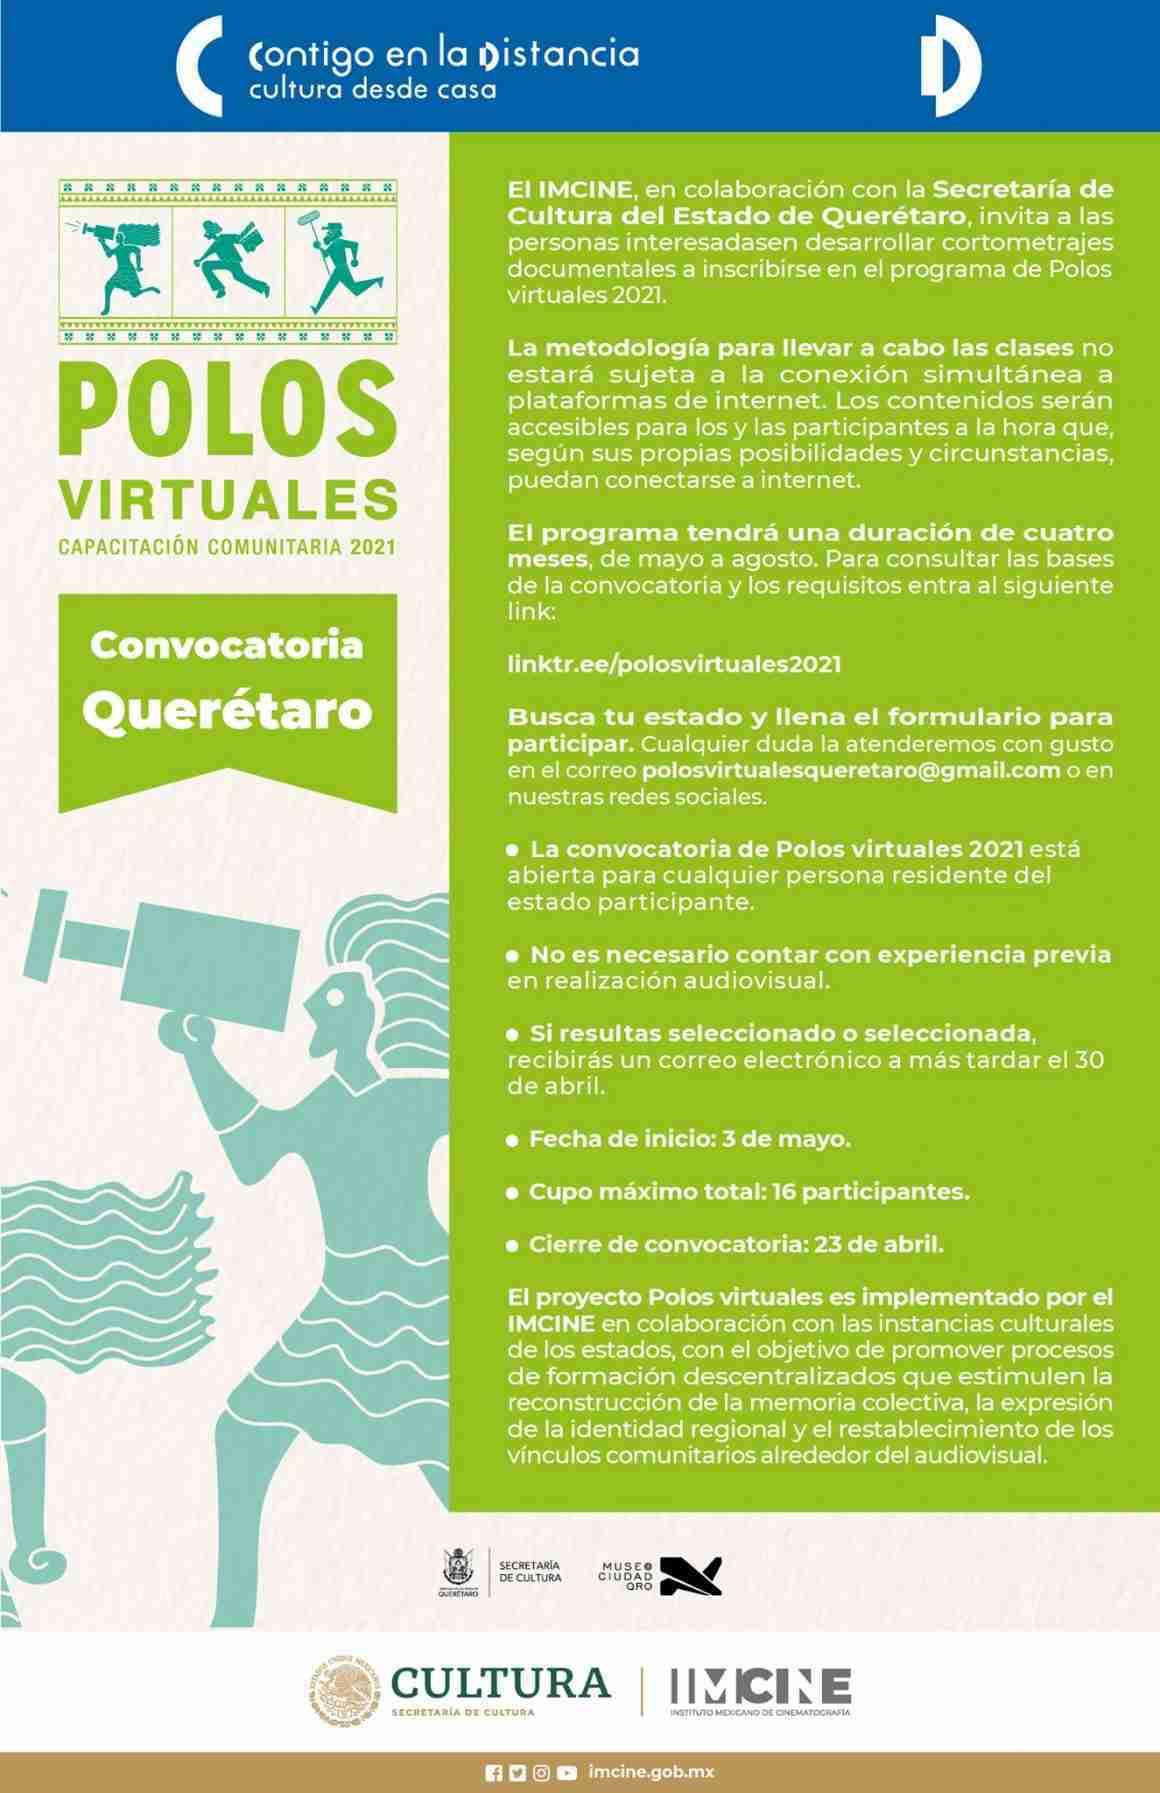 Polos Virtuales